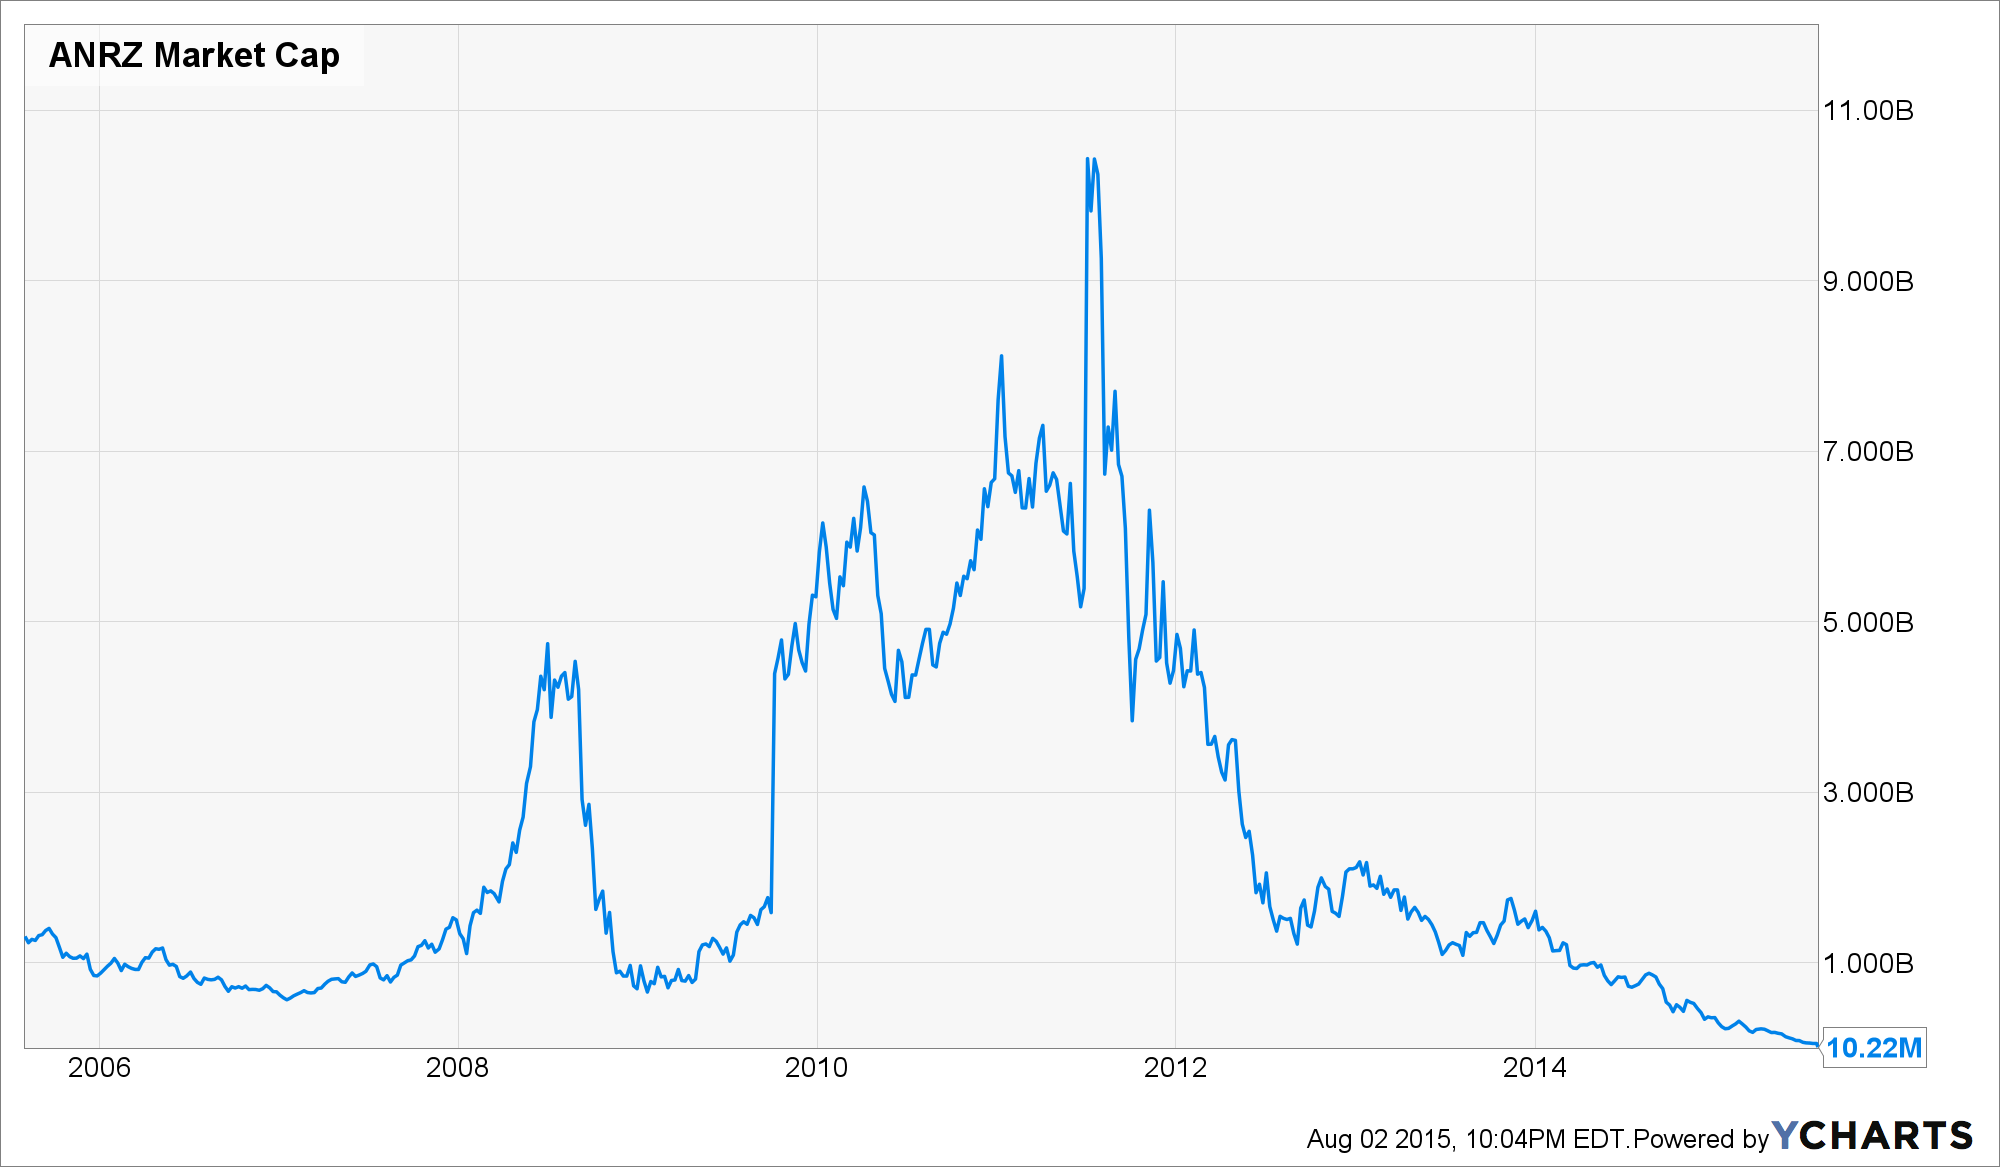 ANRZ Market Cap Chart